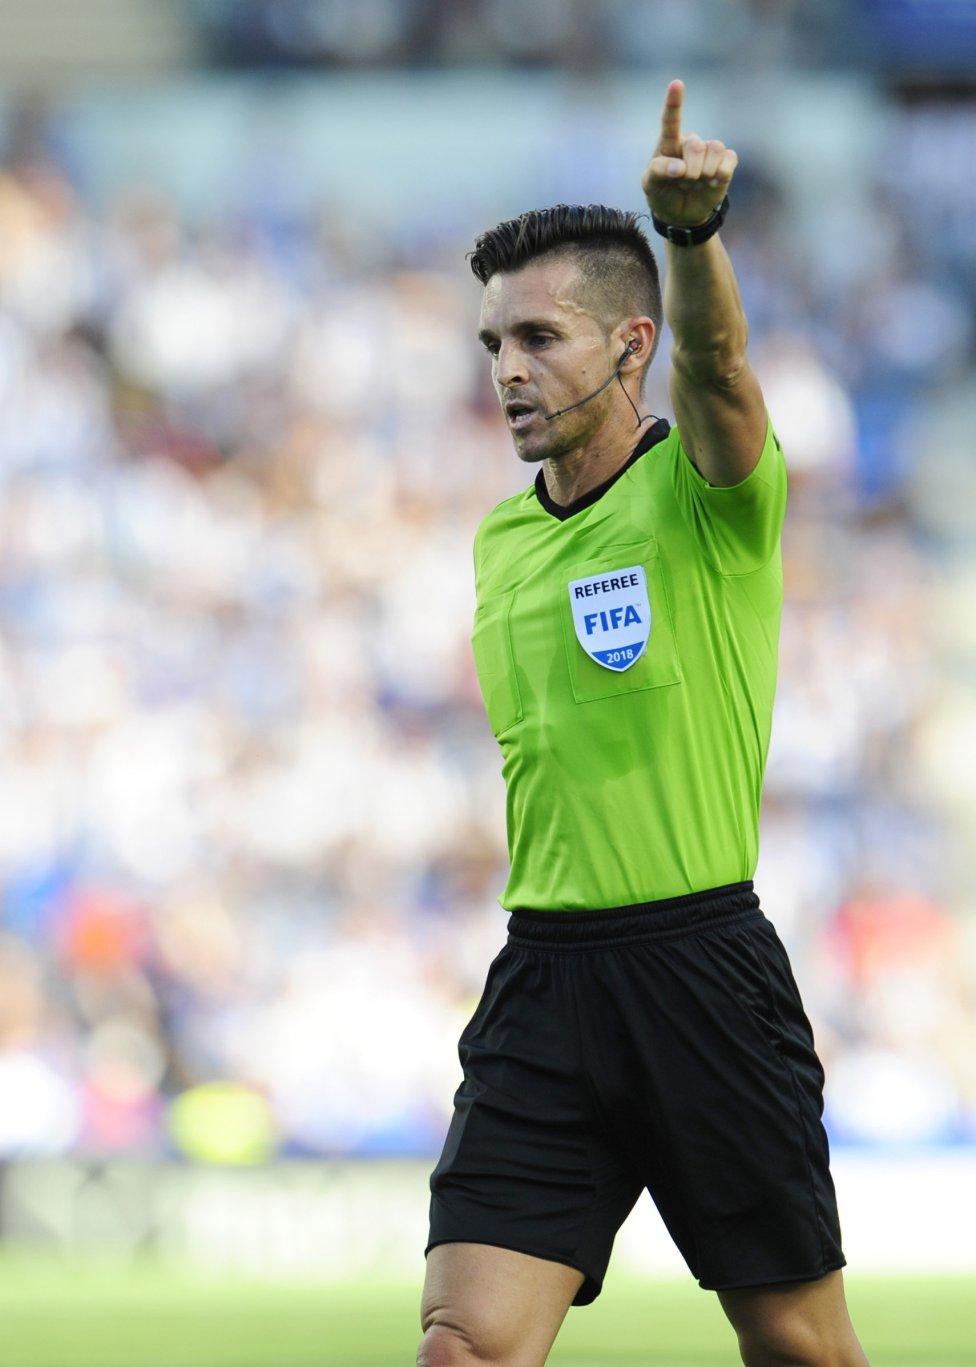 صور مباراة : ريال سوسيداد - برشلونة 1-2 ( 15-09-2018 ) 1537020921_207758_1537027604_album_grande